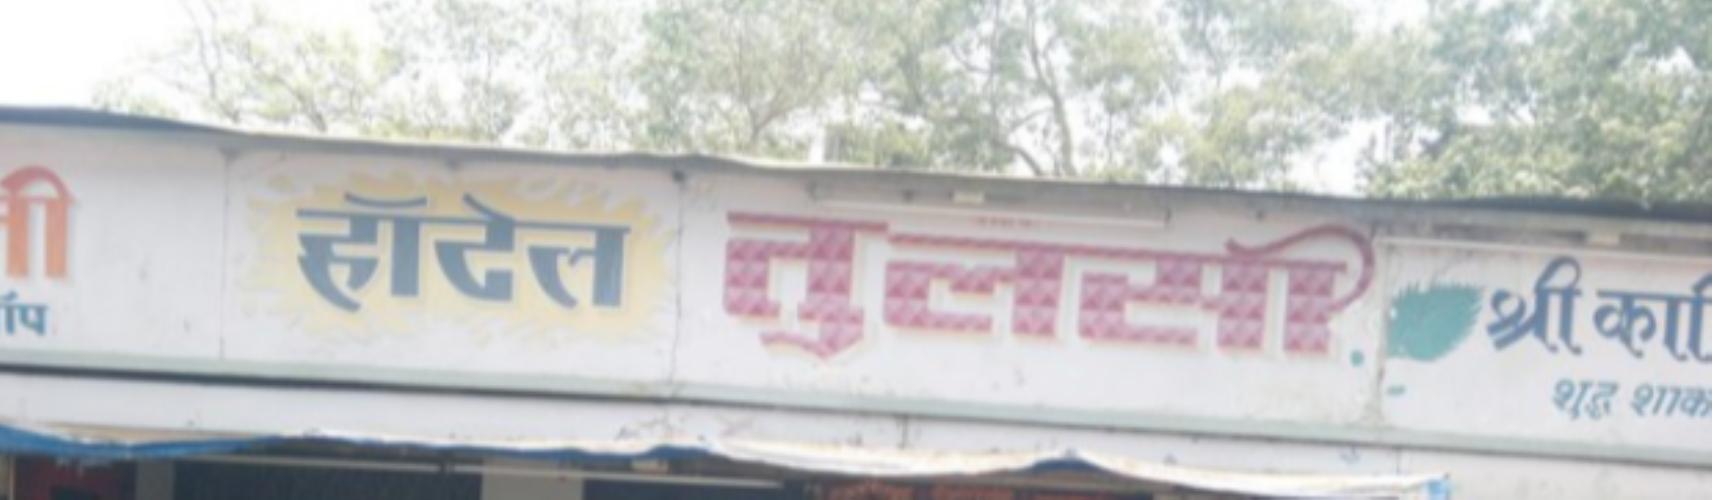 HOTEL SHRI TULSI, KANDIVALI, MUMBAI - Reviews | Menu| Cost for Two ...